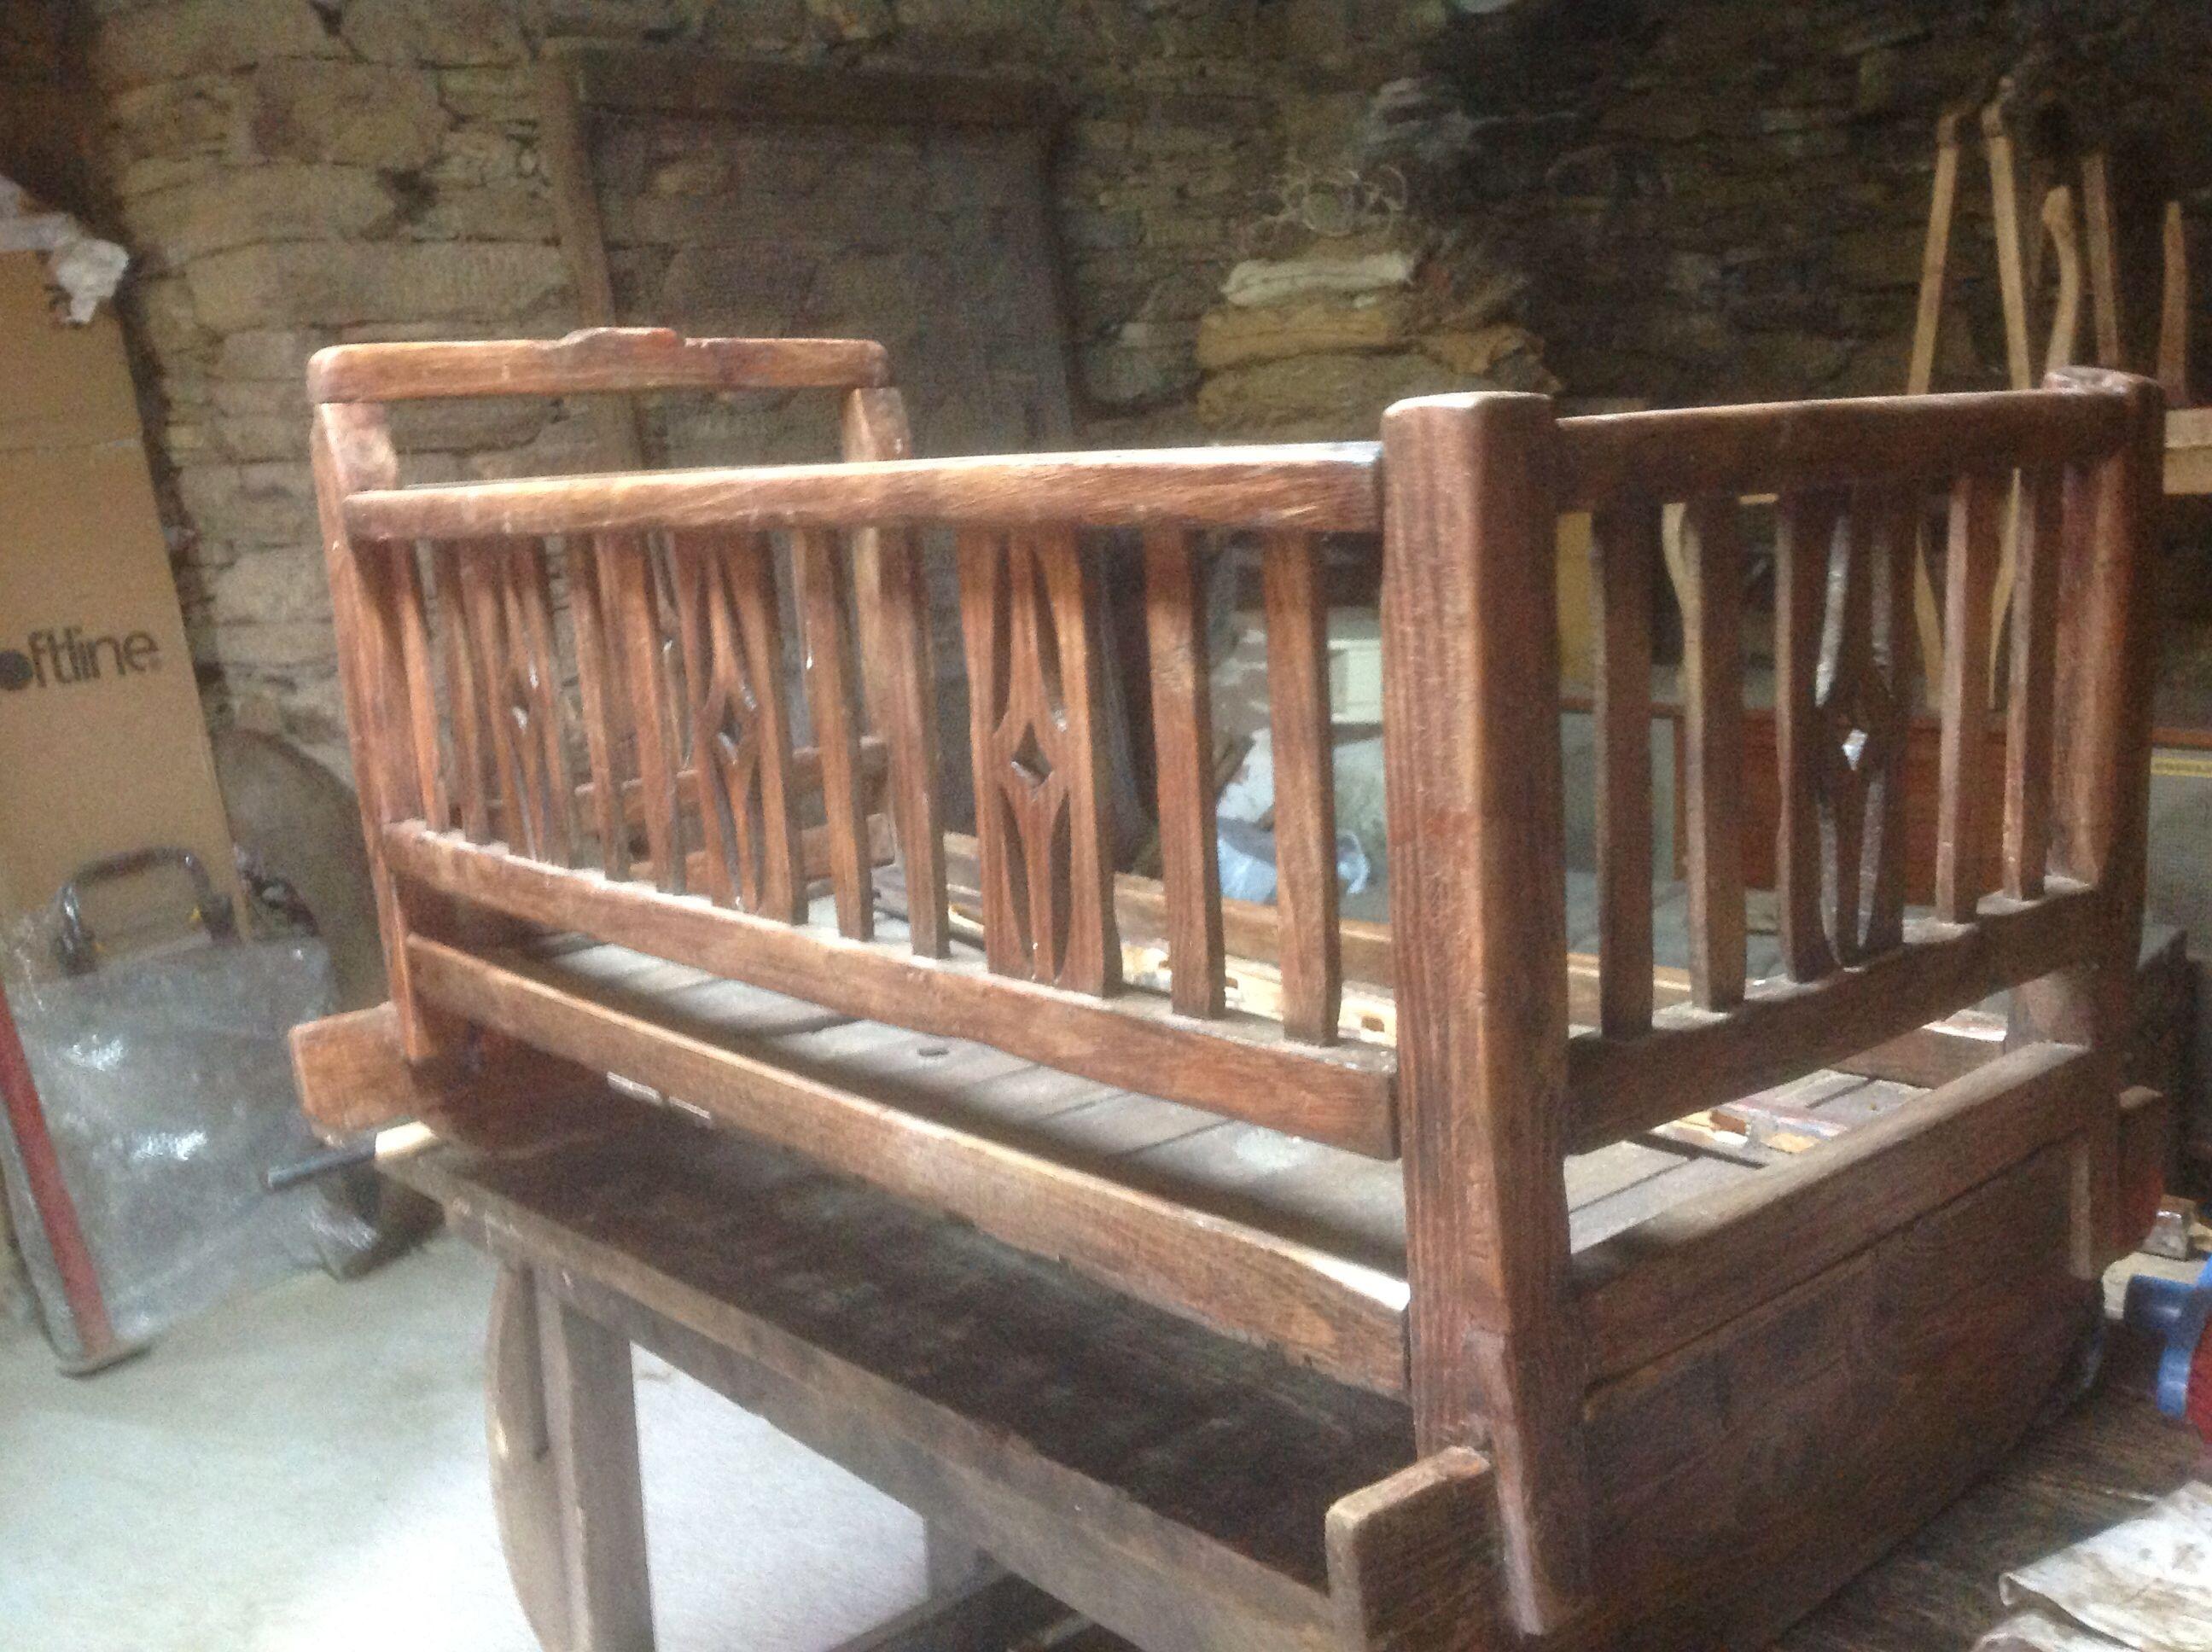 Cuna antigua para restaurar | Muebles restaurados | Pinterest ...